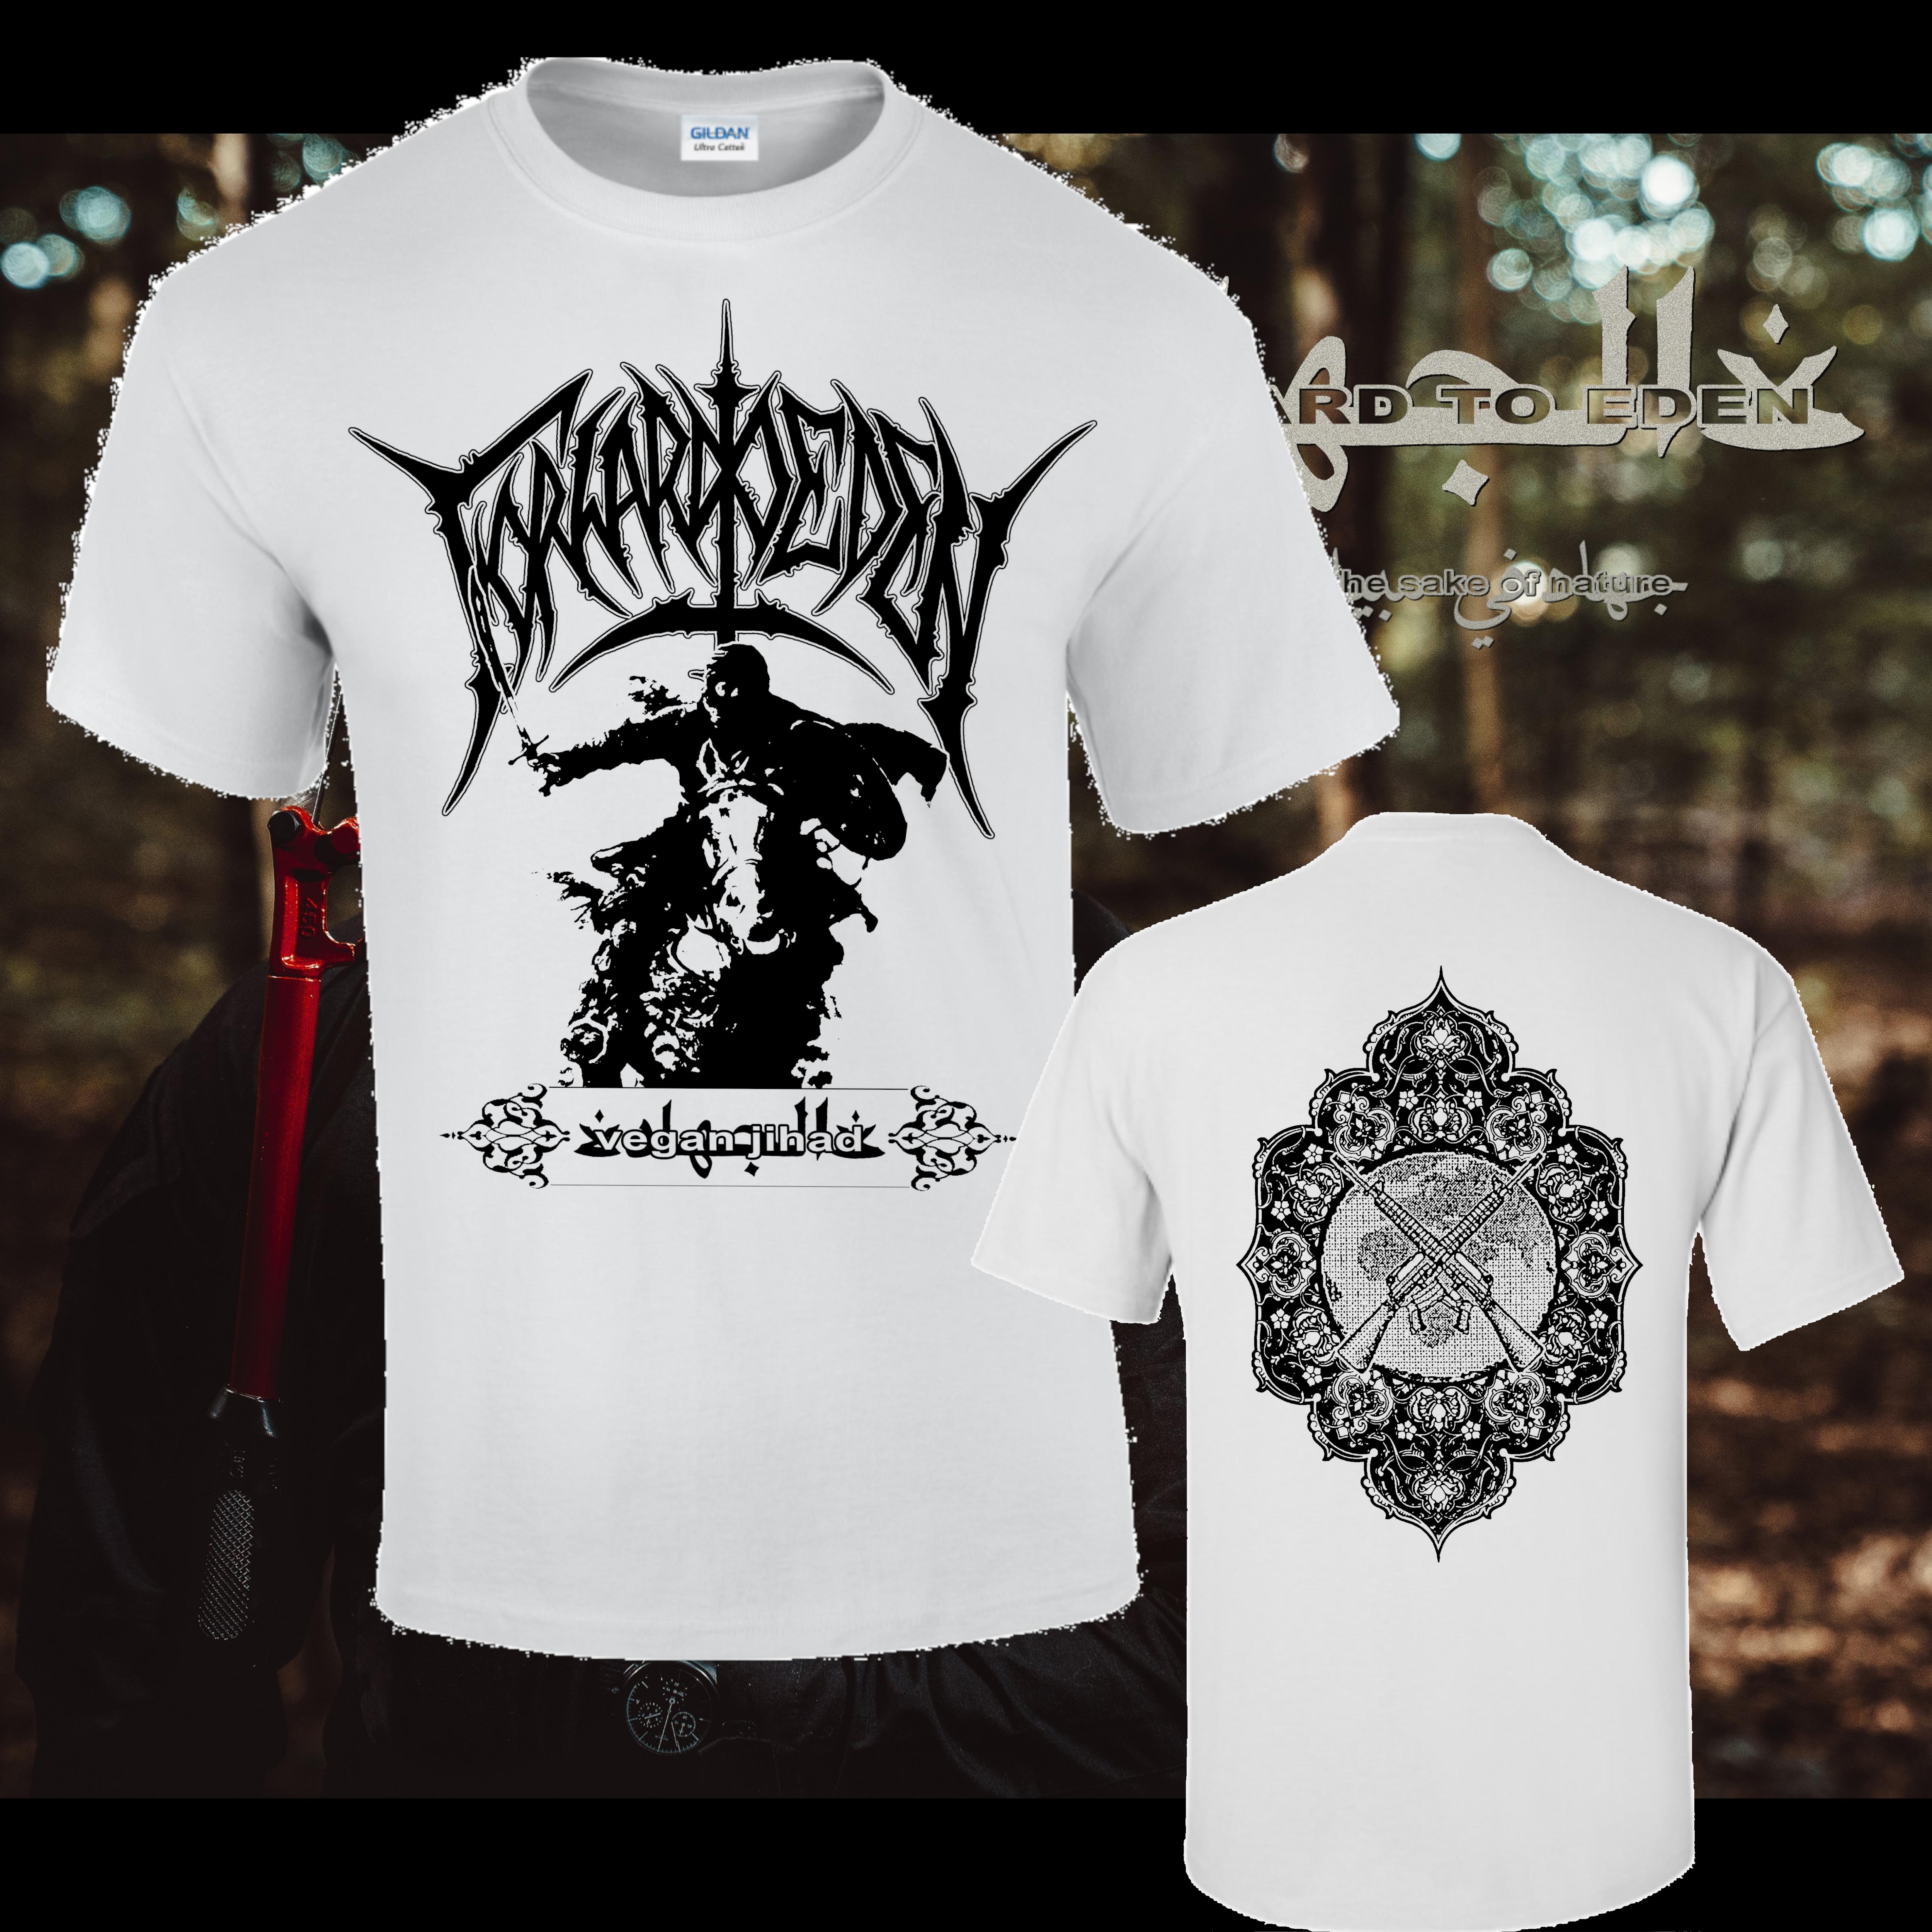 shirts mockup jihad design with logo